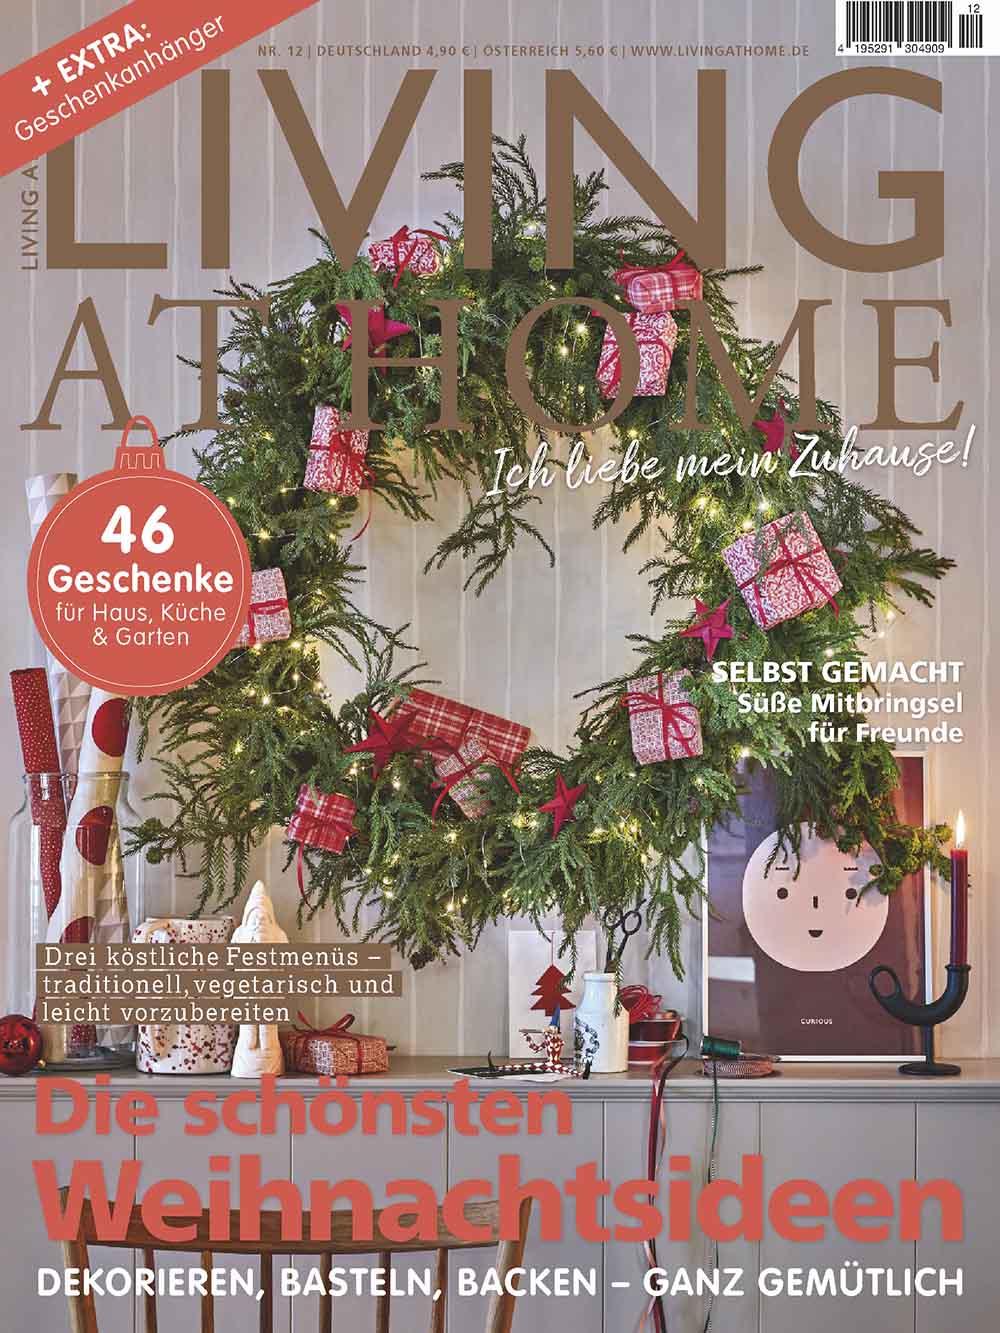 ELOA UNIQUE LIGHTS Living at Home_12-20_Cover